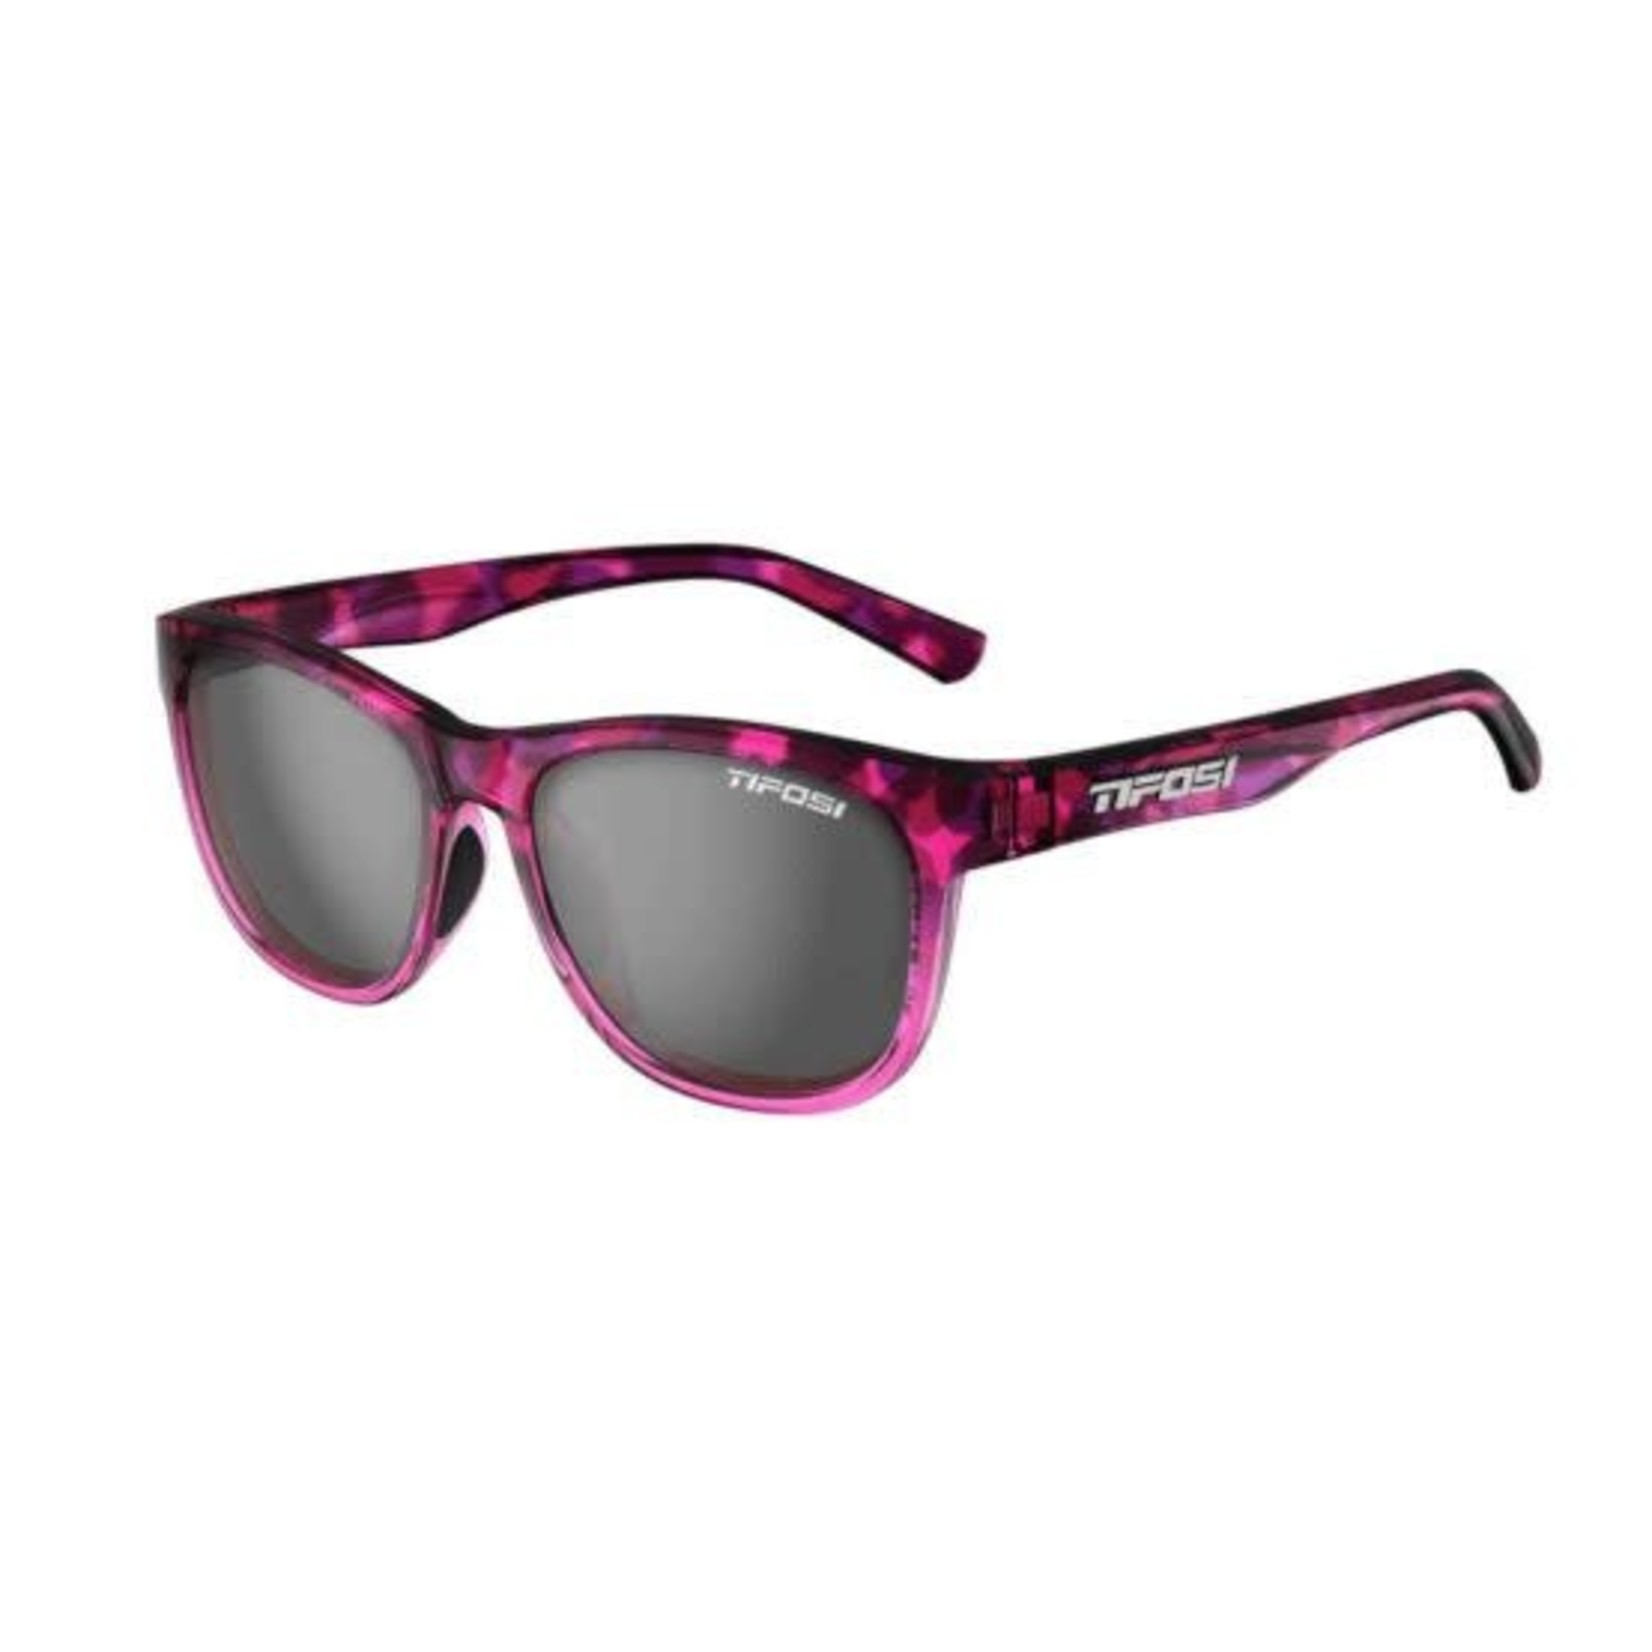 Tifosi Optics Swank, Pink Confetti Single Lens Sunglasses